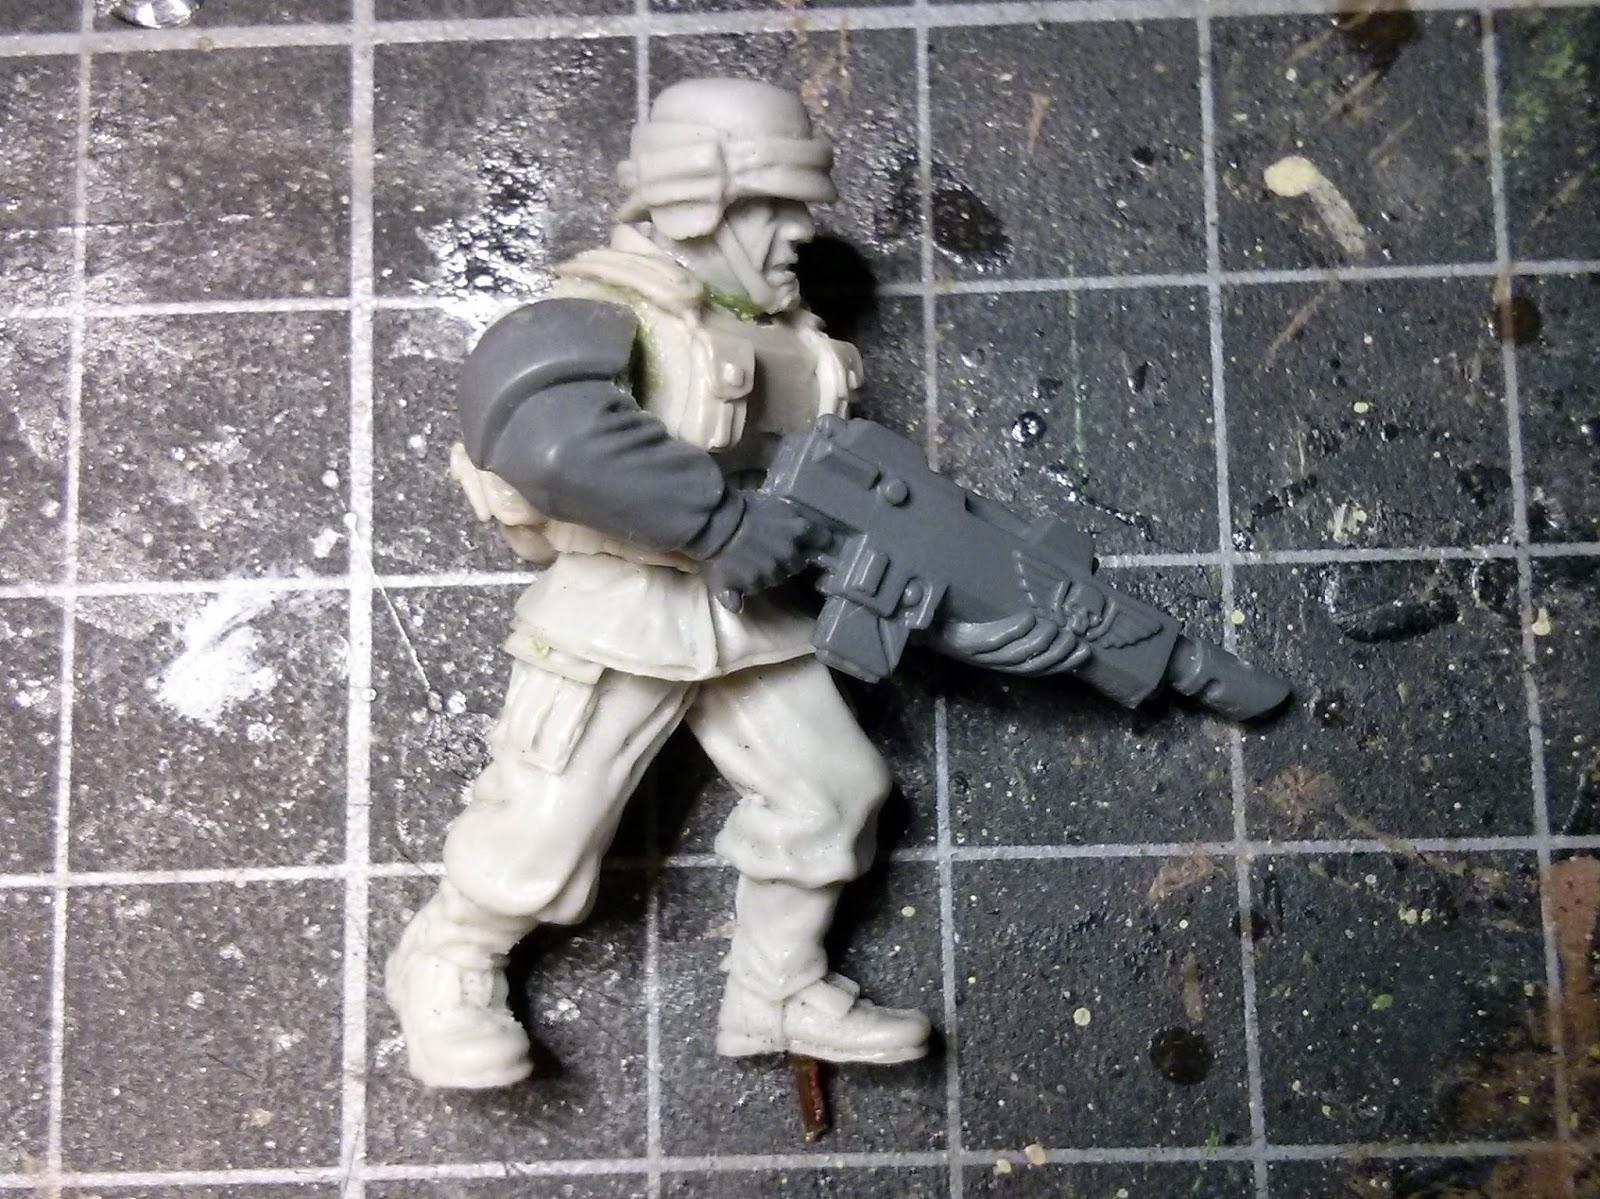 Imperial Guard, Cadian, Maxmini, Combat Armour, Victoria Miniatures, Arcadian, Conversion